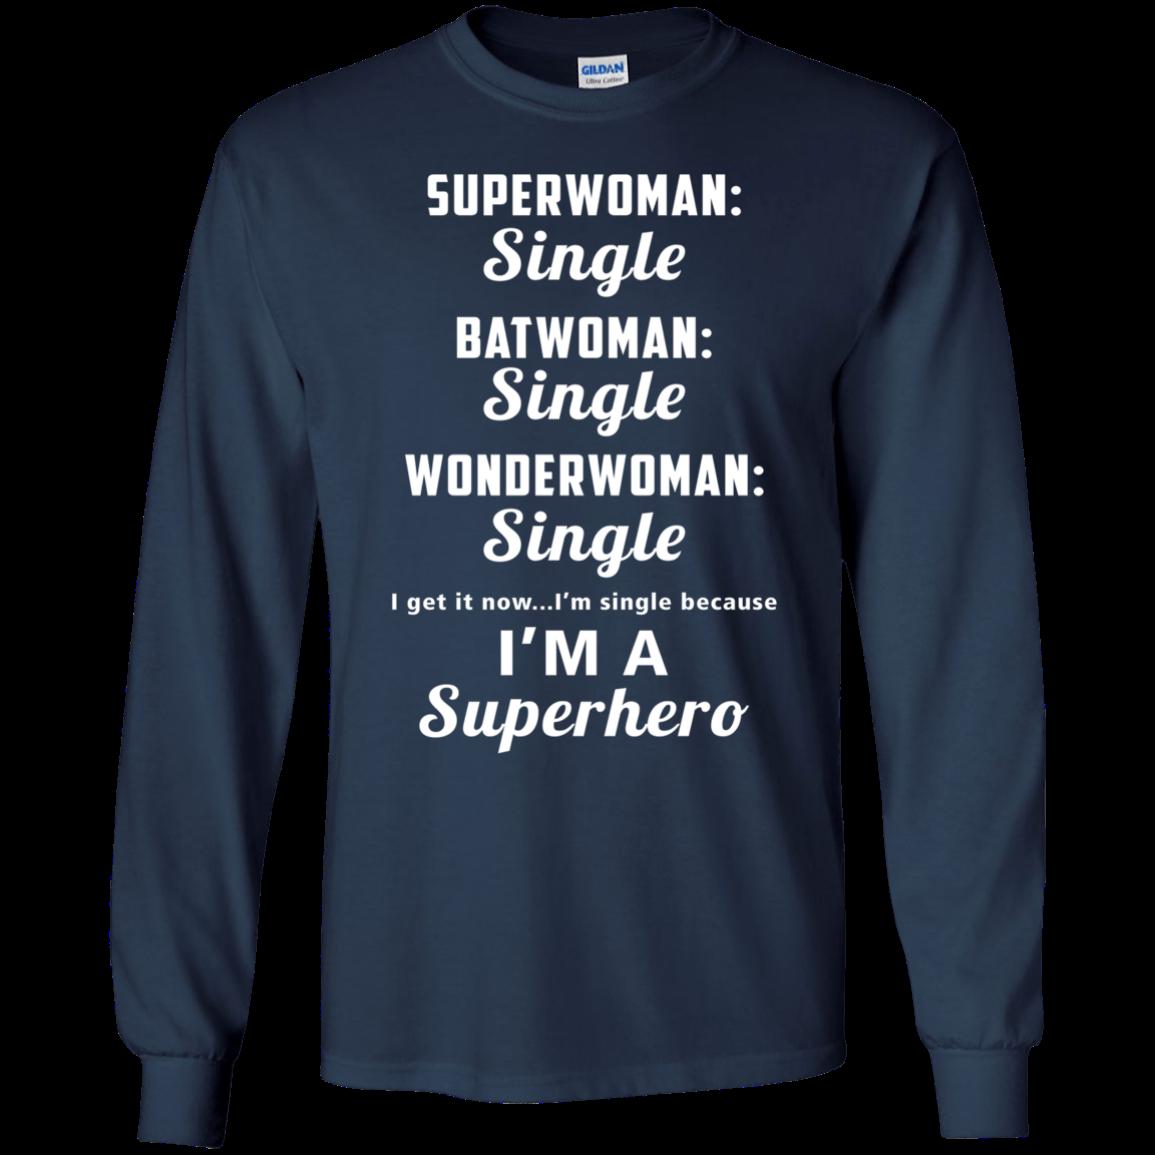 315e70c2 Single girl shirt Superwoman single Batwoman single I'm a superhero t shirt,  tank